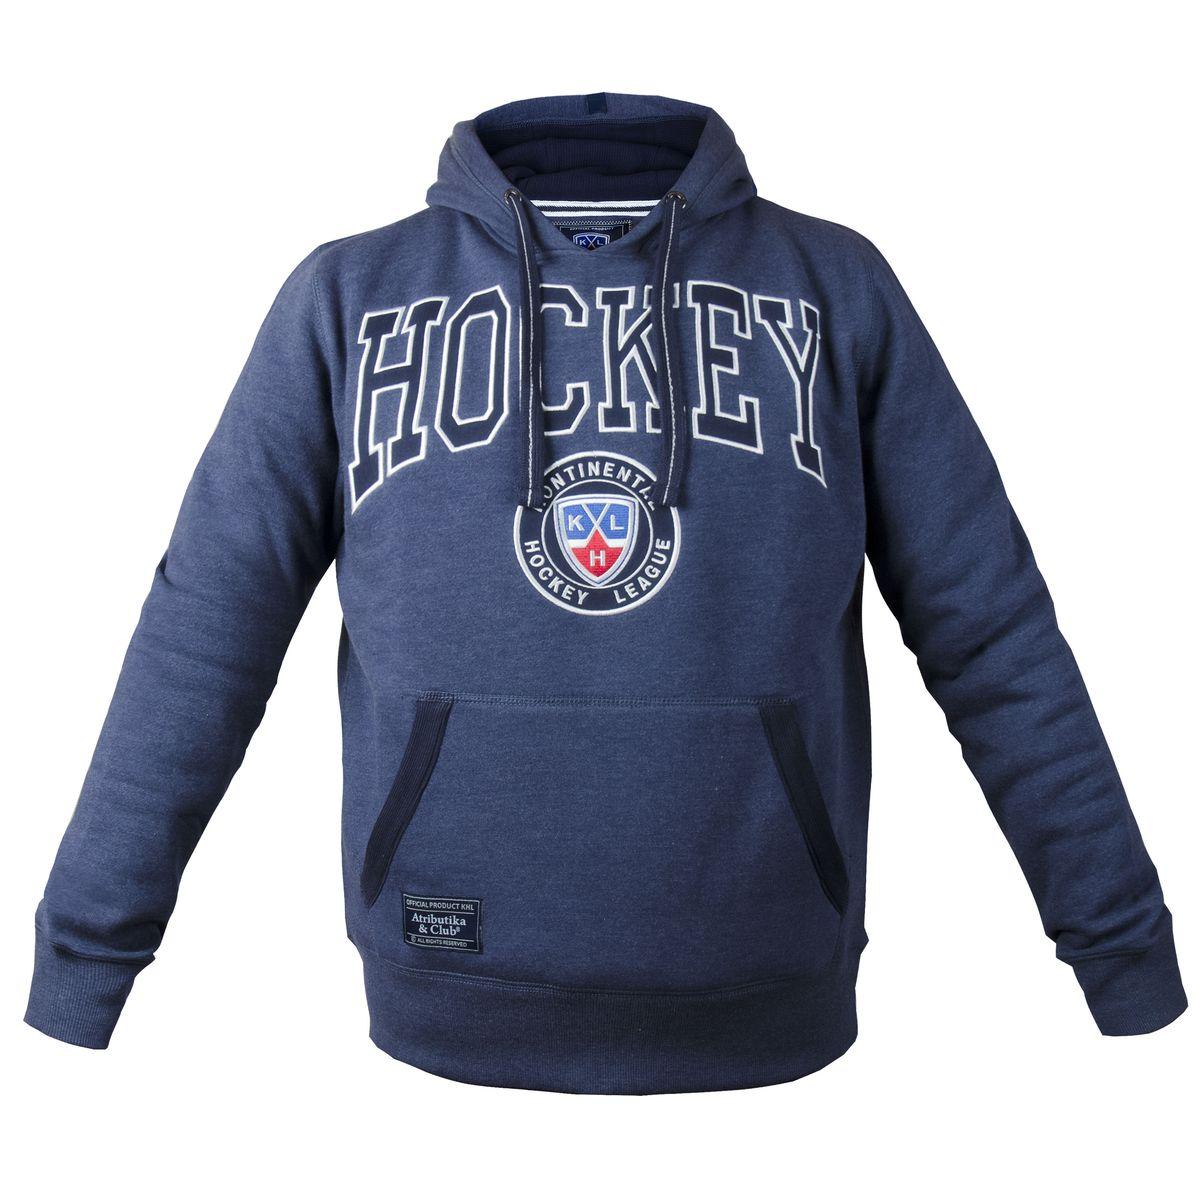 Толстовка мужская КХЛ, цвет: синий меланж. 321020. Размер XXL (56) - Хоккей